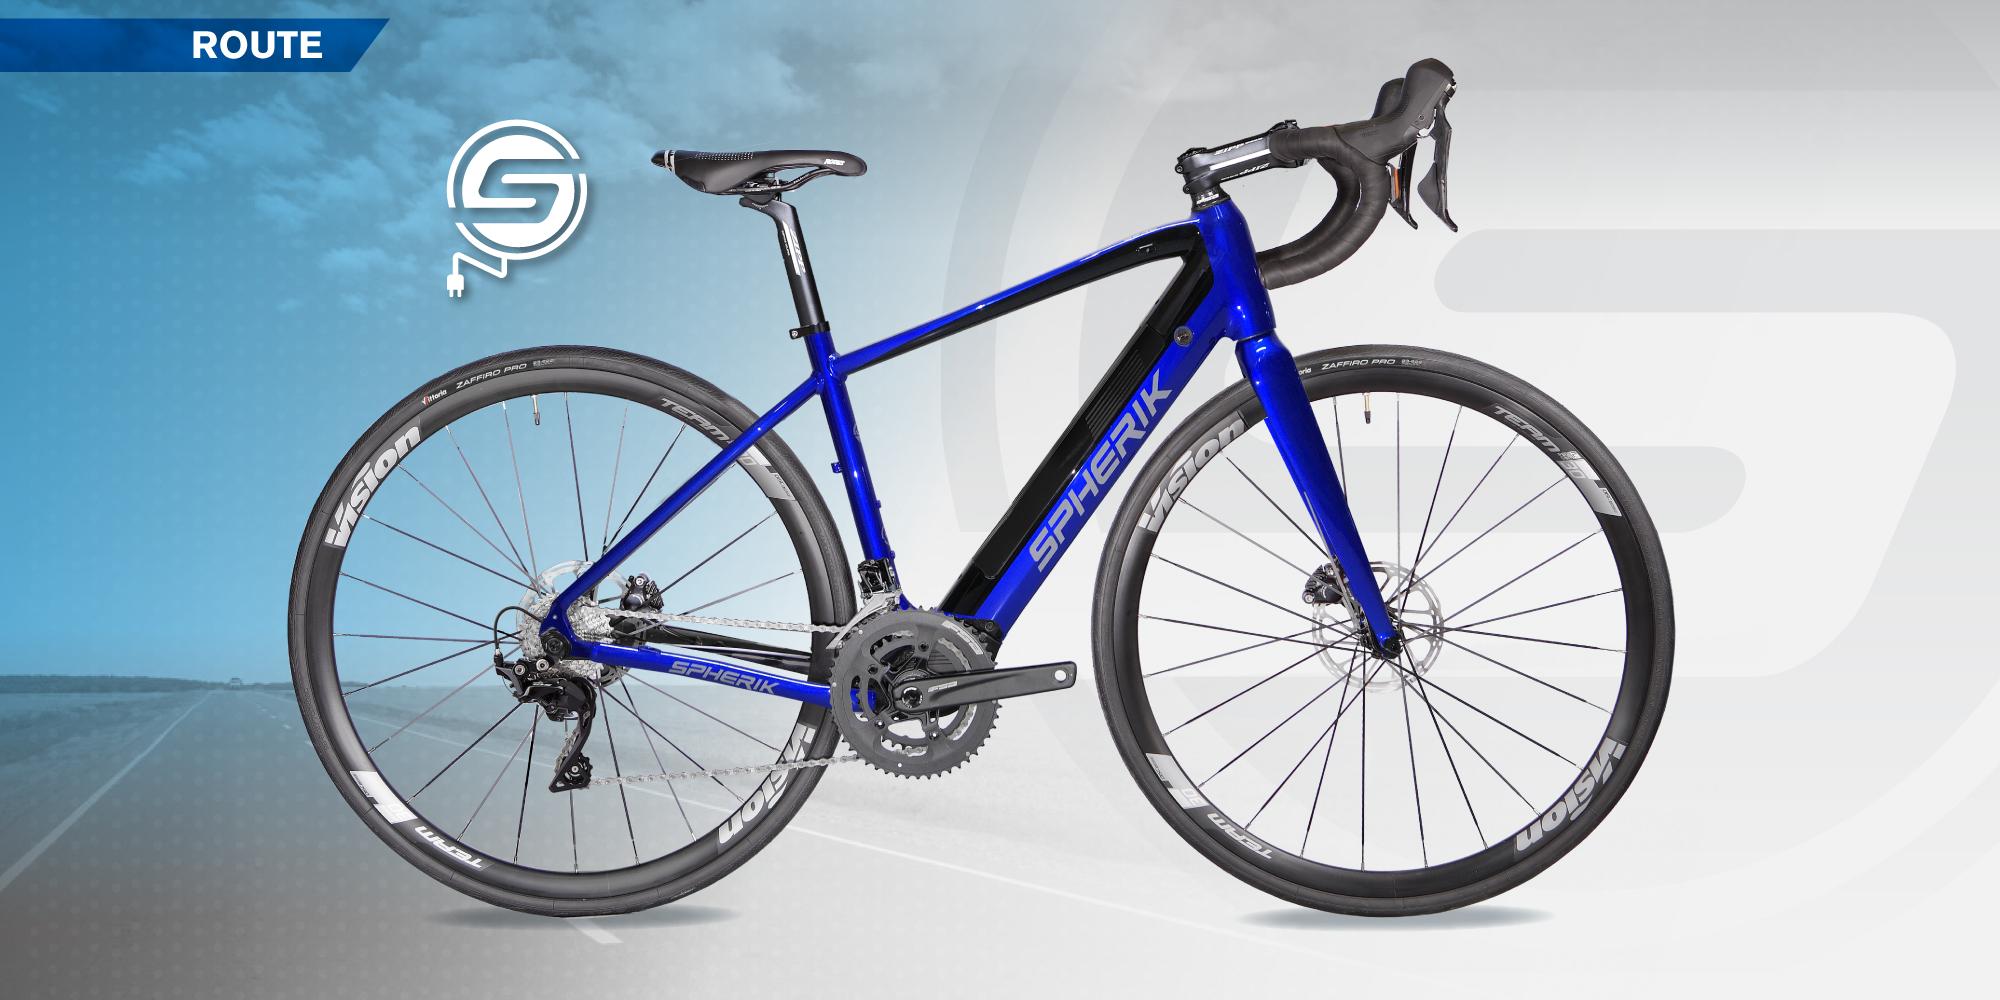 SEAL E-bike